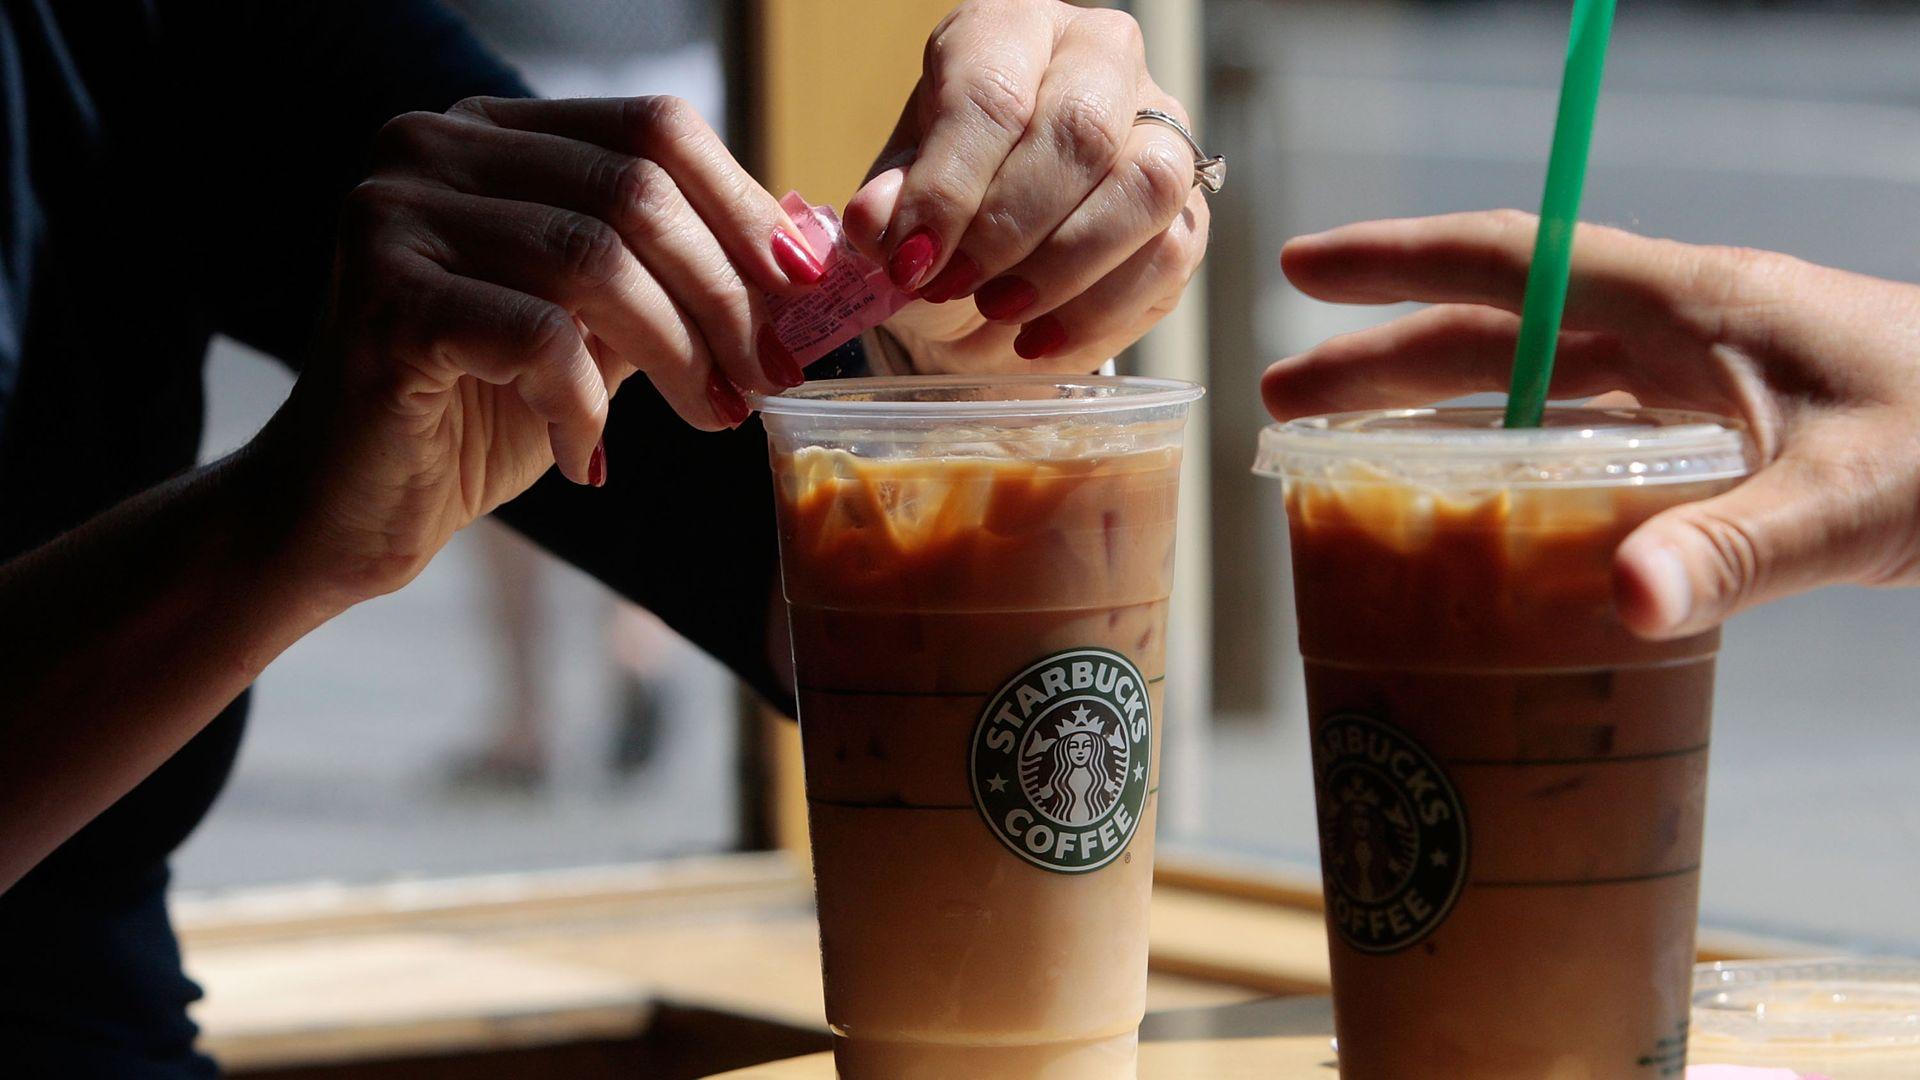 Two people prepare cold Starbucks drinks